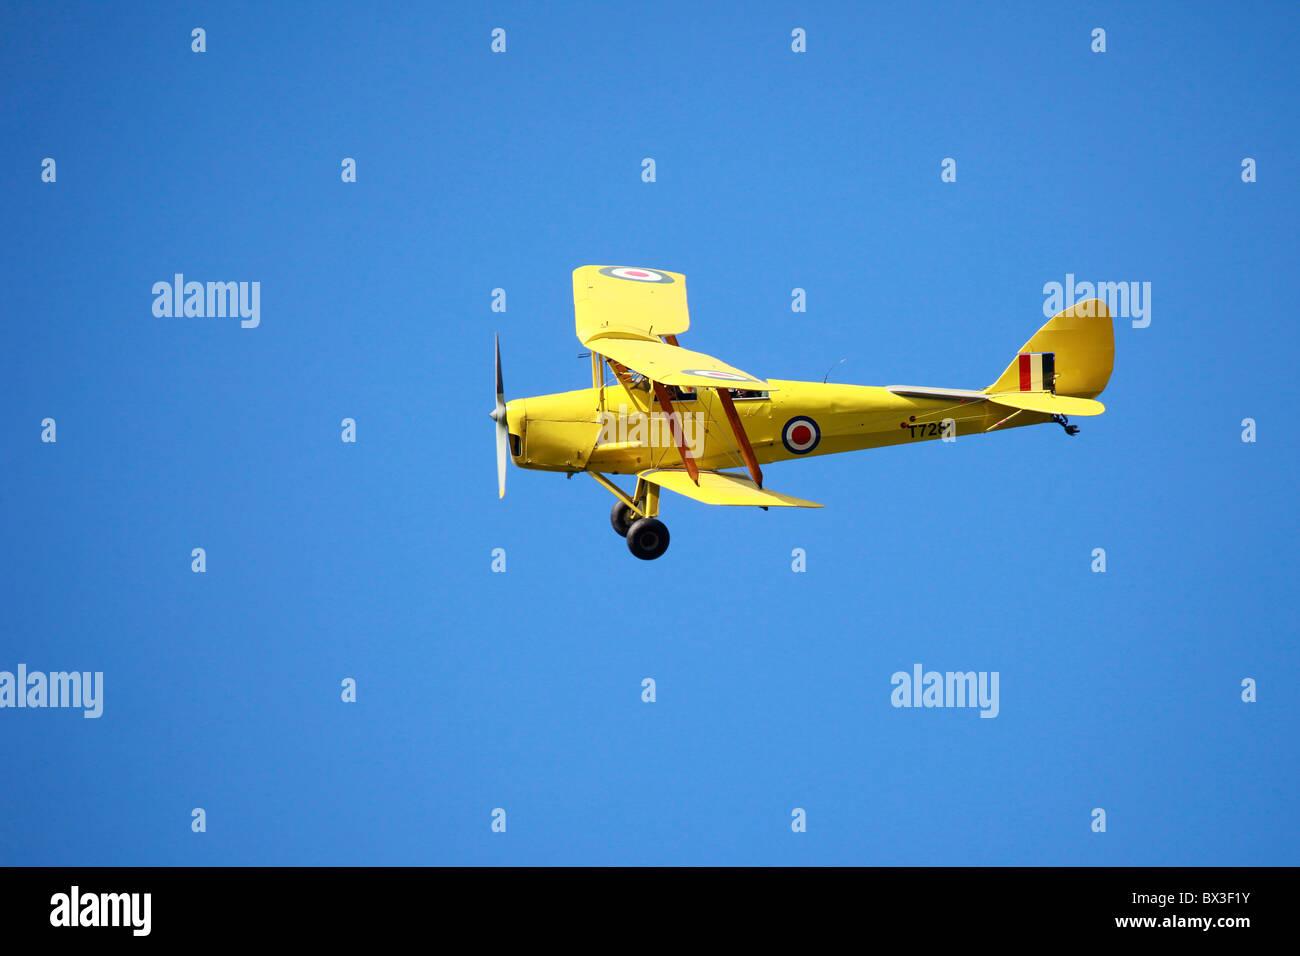 Chipmunk T 7281 in Flight _ De Havilland DH.82A Tiger Moth, G-ARTL / T7281, Private yellow bi-plane, UK - Stock Image